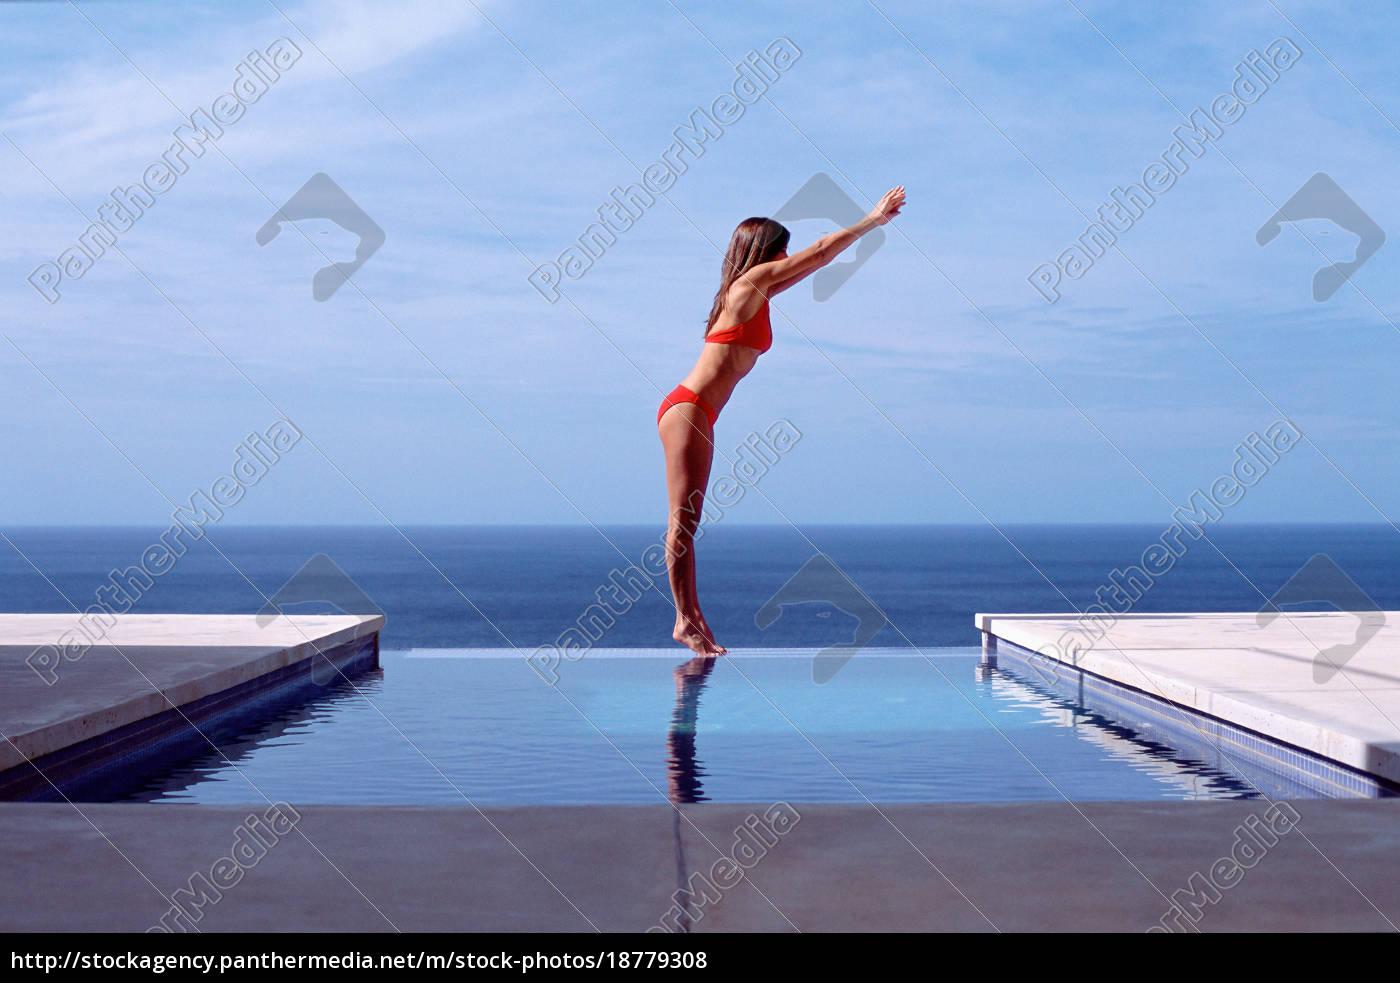 junge, frau, im, schwimmbad, am, meer - 18779308